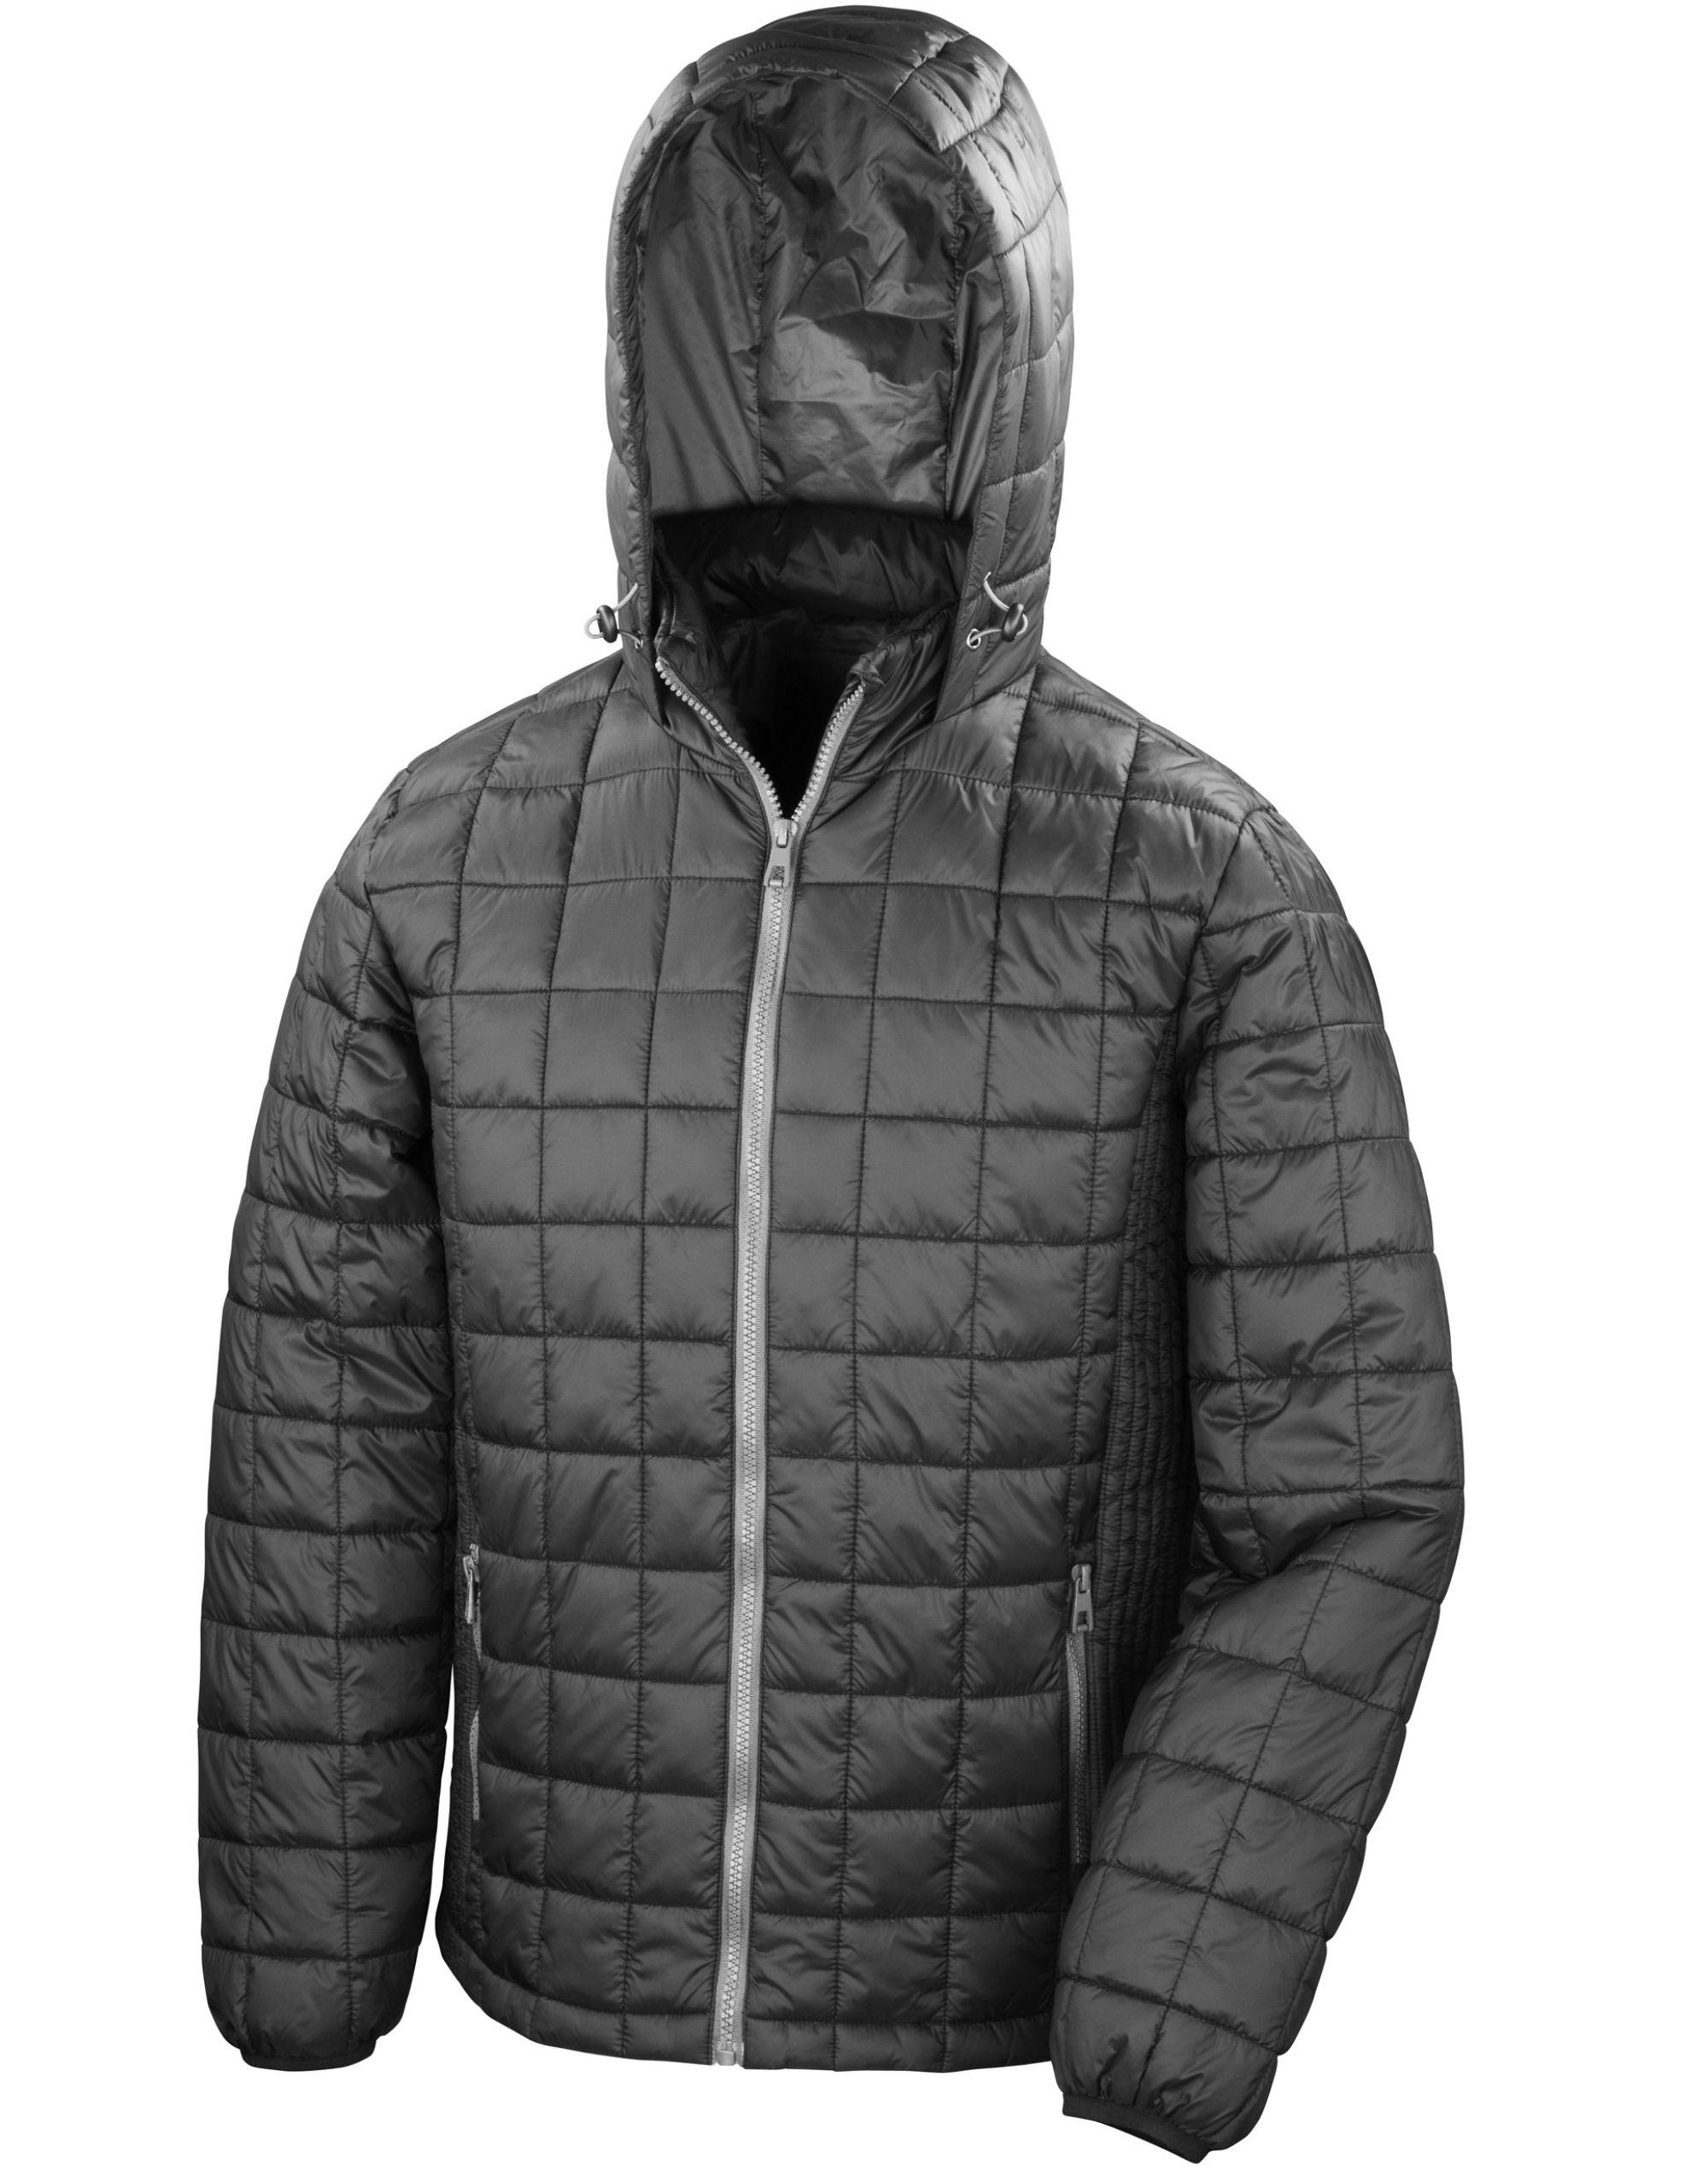 Result Urban Blizzard Jacket